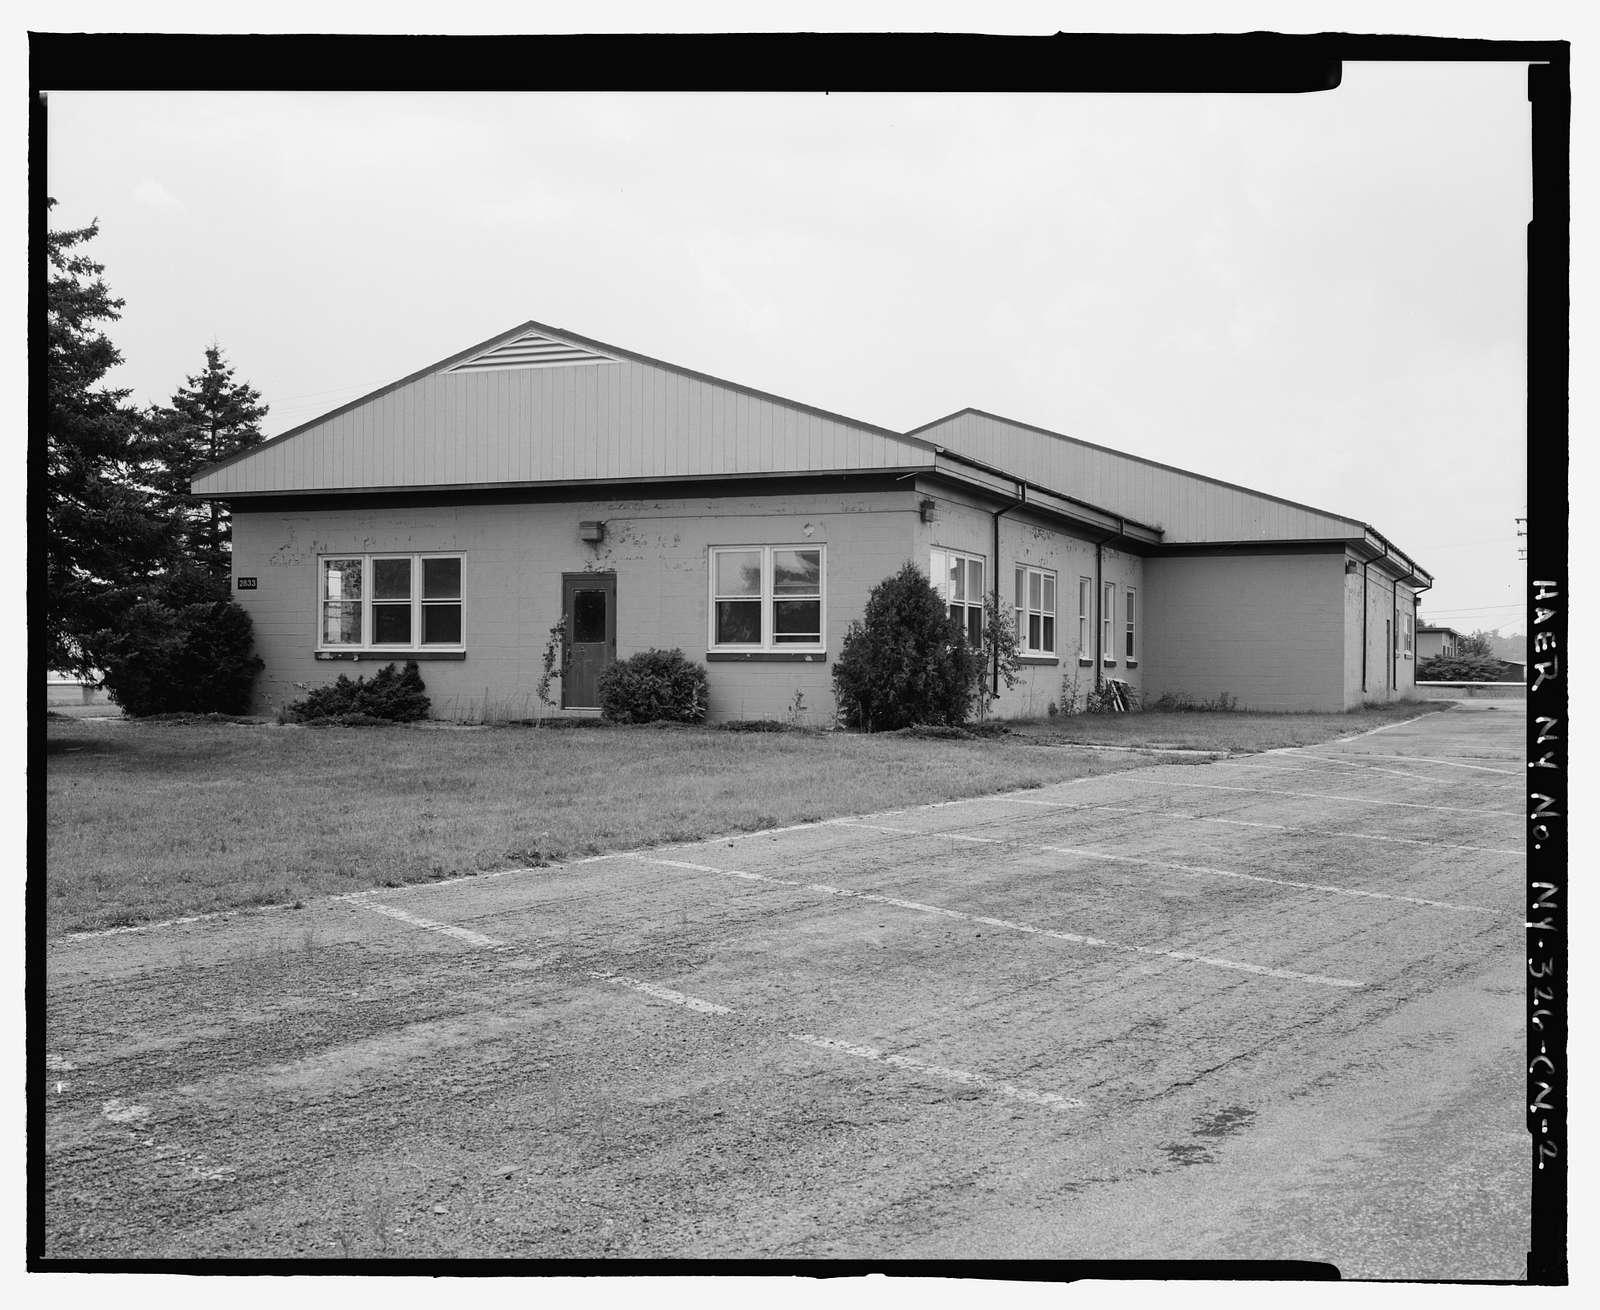 Plattsburgh Air Force Base, Squadron Operations Building, Delaware Street, Plattsburgh, Clinton County, NY